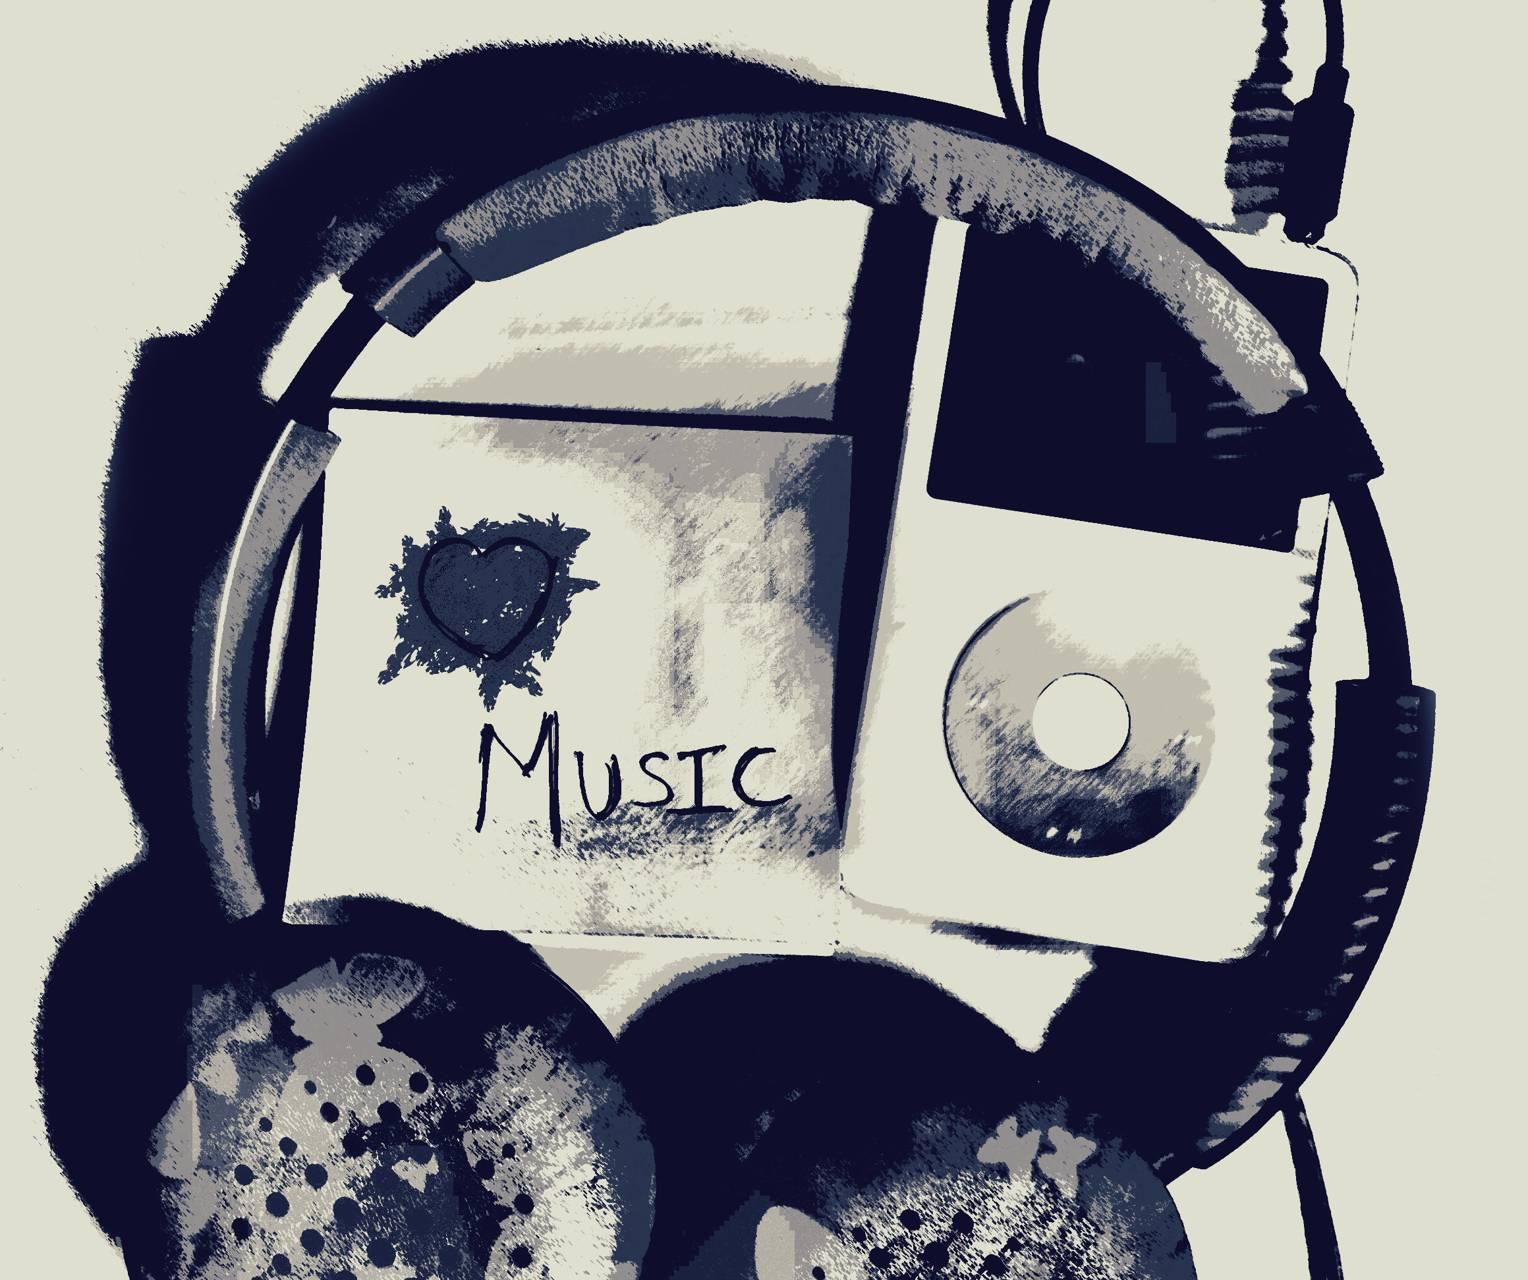 Music-love S2